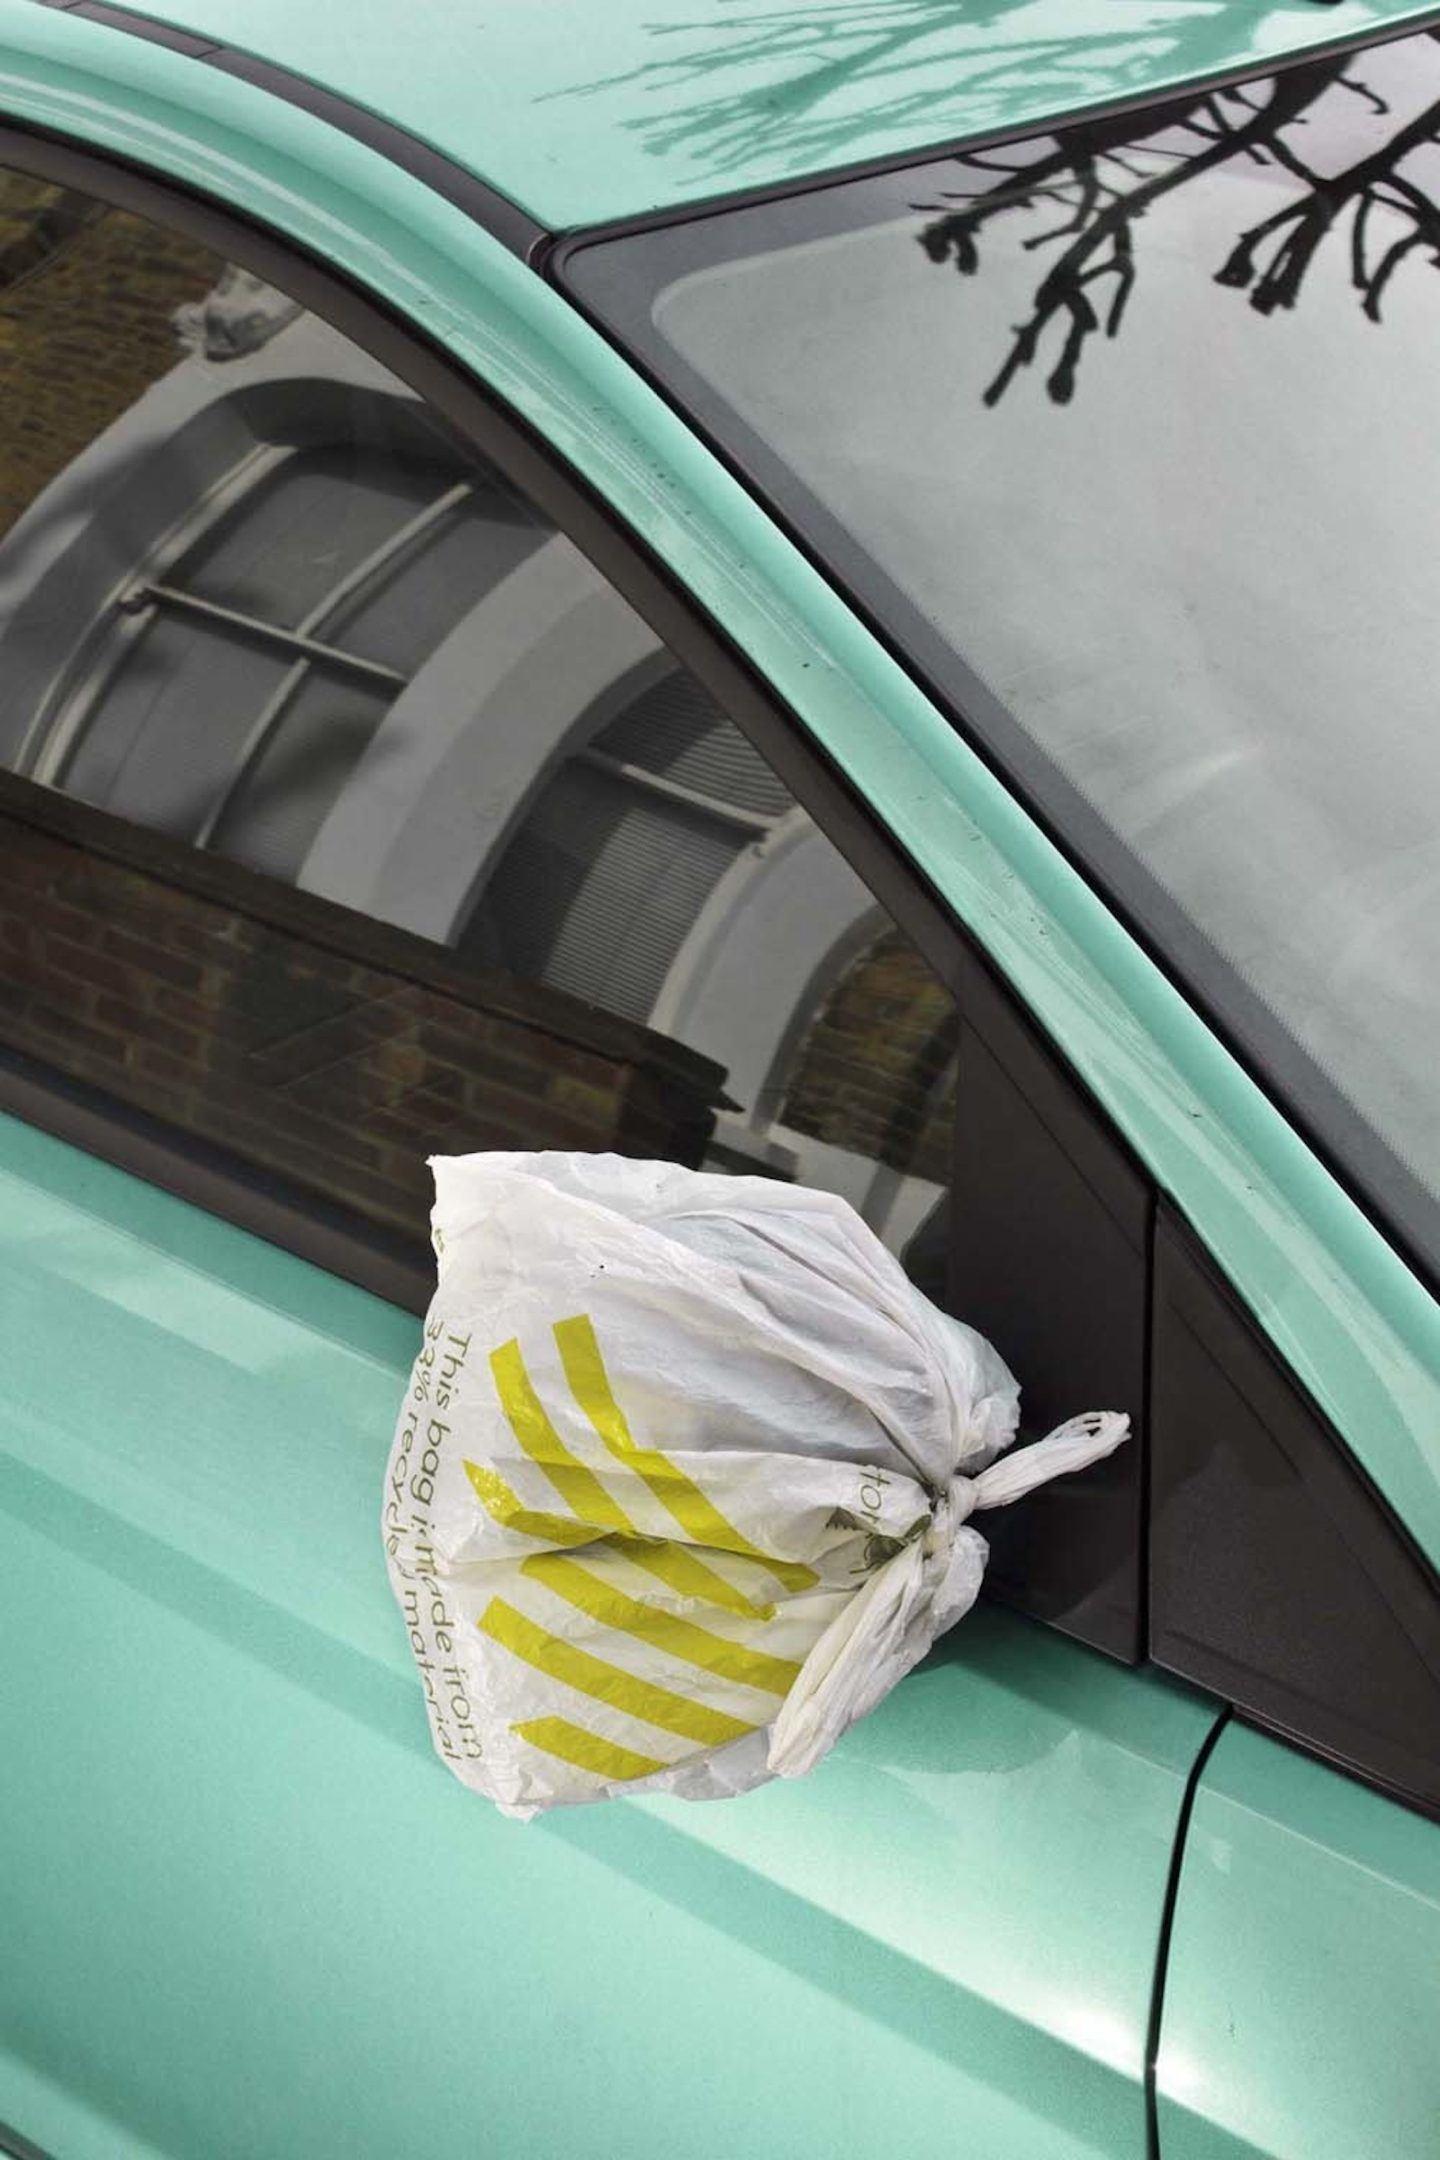 IGNANT-Print-Ronni-Campana-Badly-Repaired-Cars-018